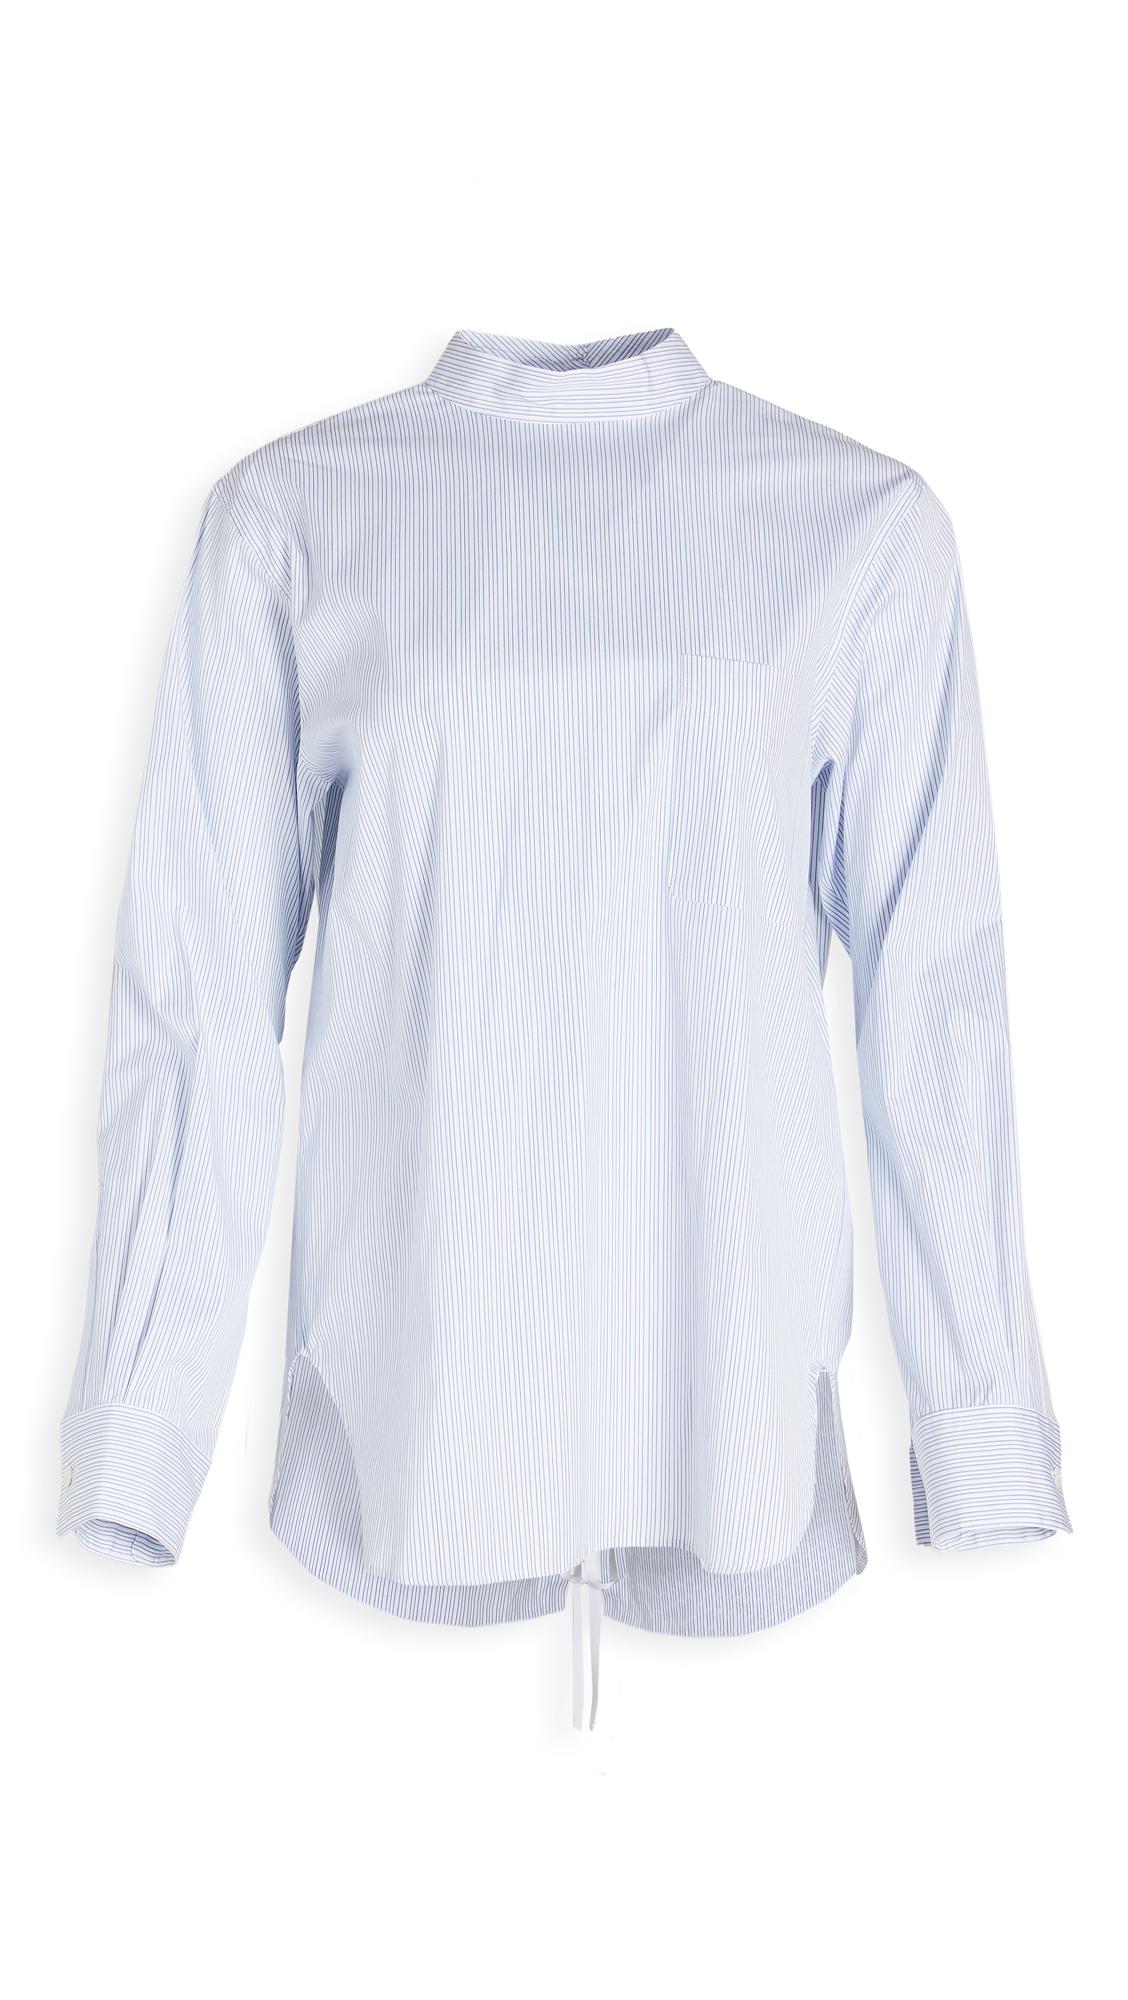 Toga Pulla Cotton Pullover Shirt